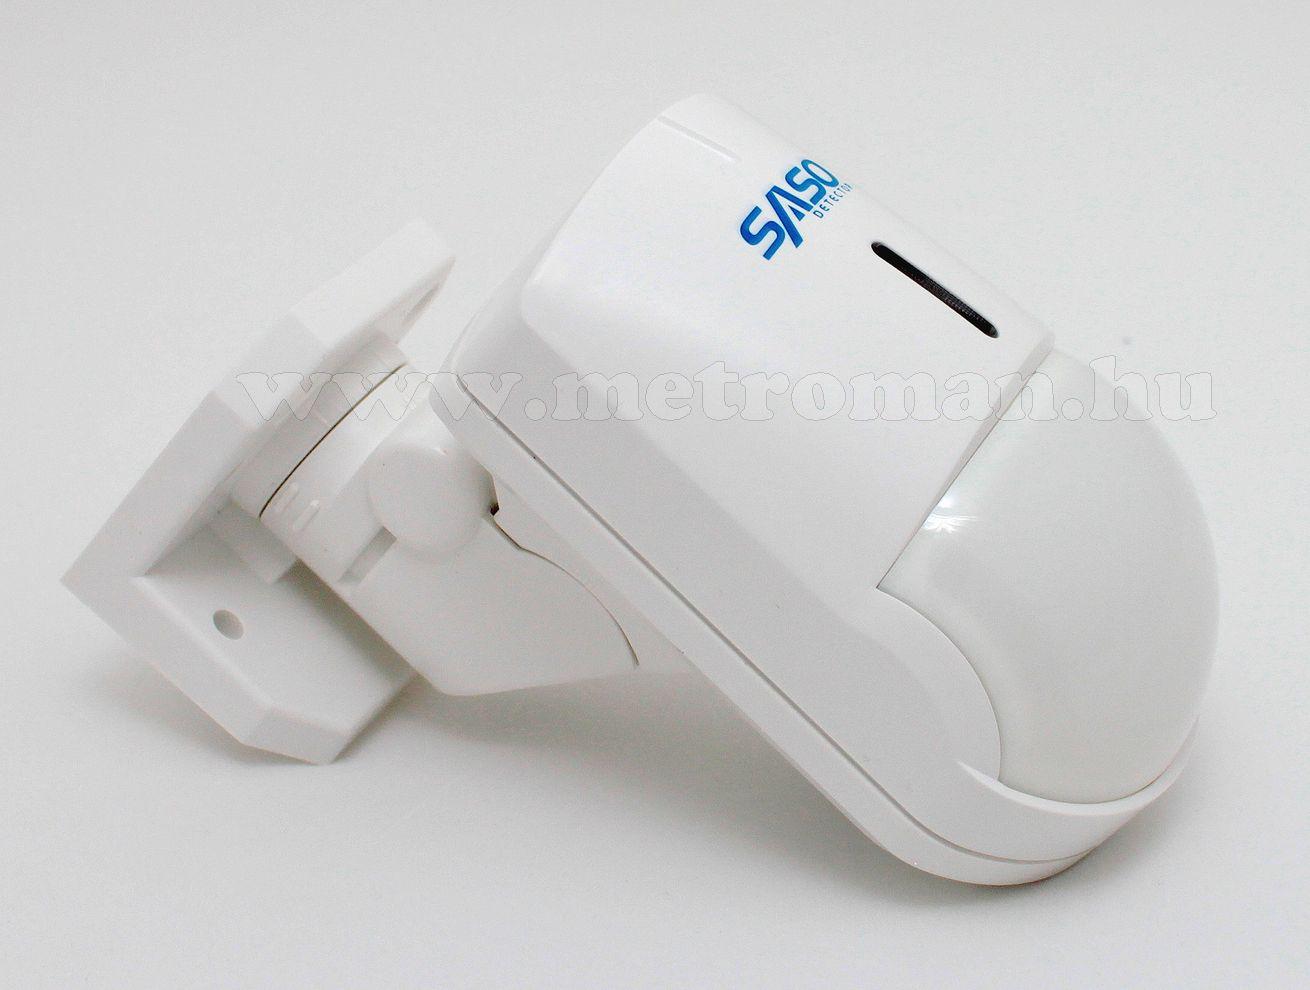 Infra mozgásérzékelő, kisállatvédelemmel,  PA-4510PT